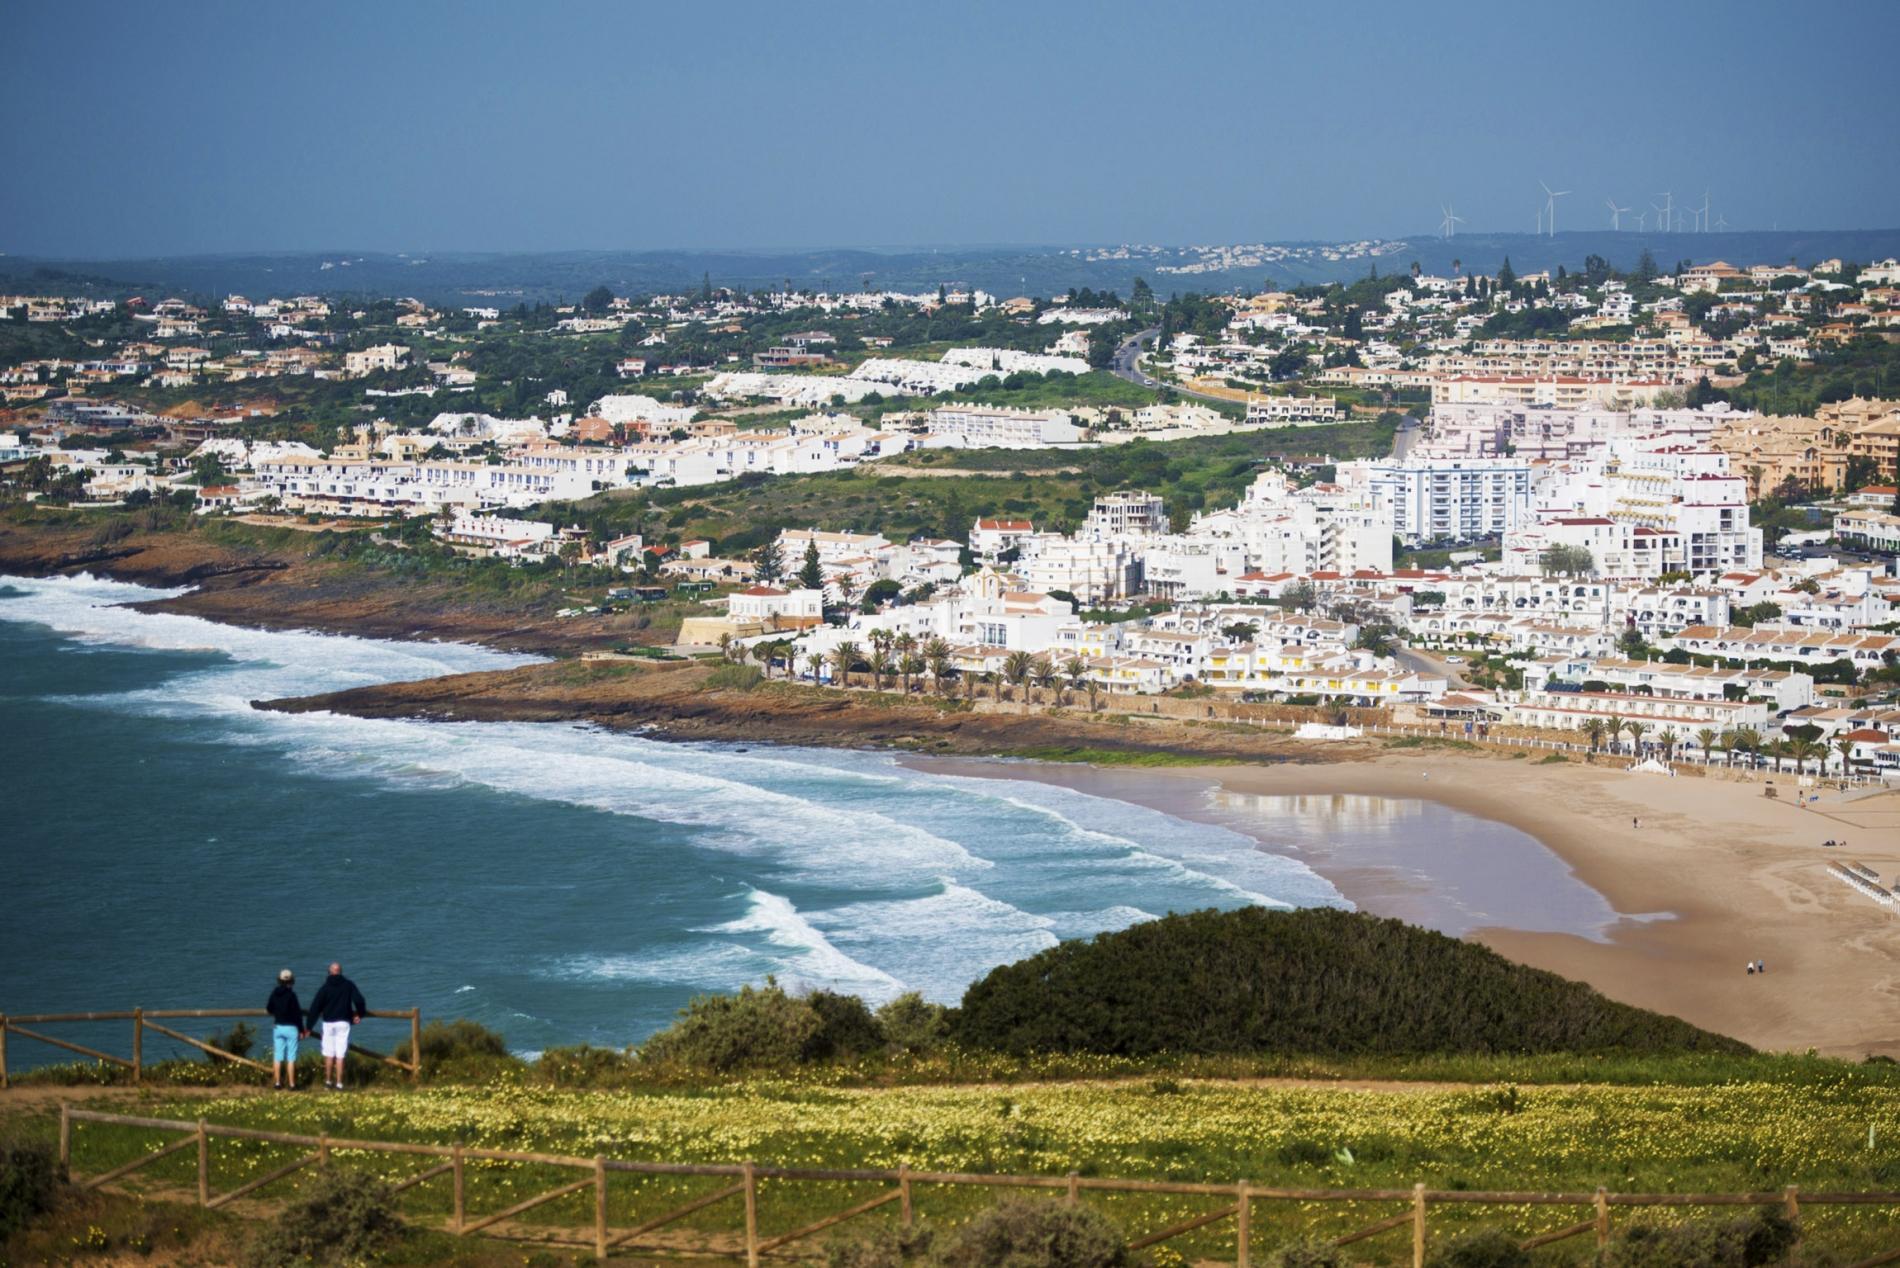 Ferienwohnung A24 - LuzBay Beach Apartment (2558091), Luz, , Algarve, Portugal, Bild 40